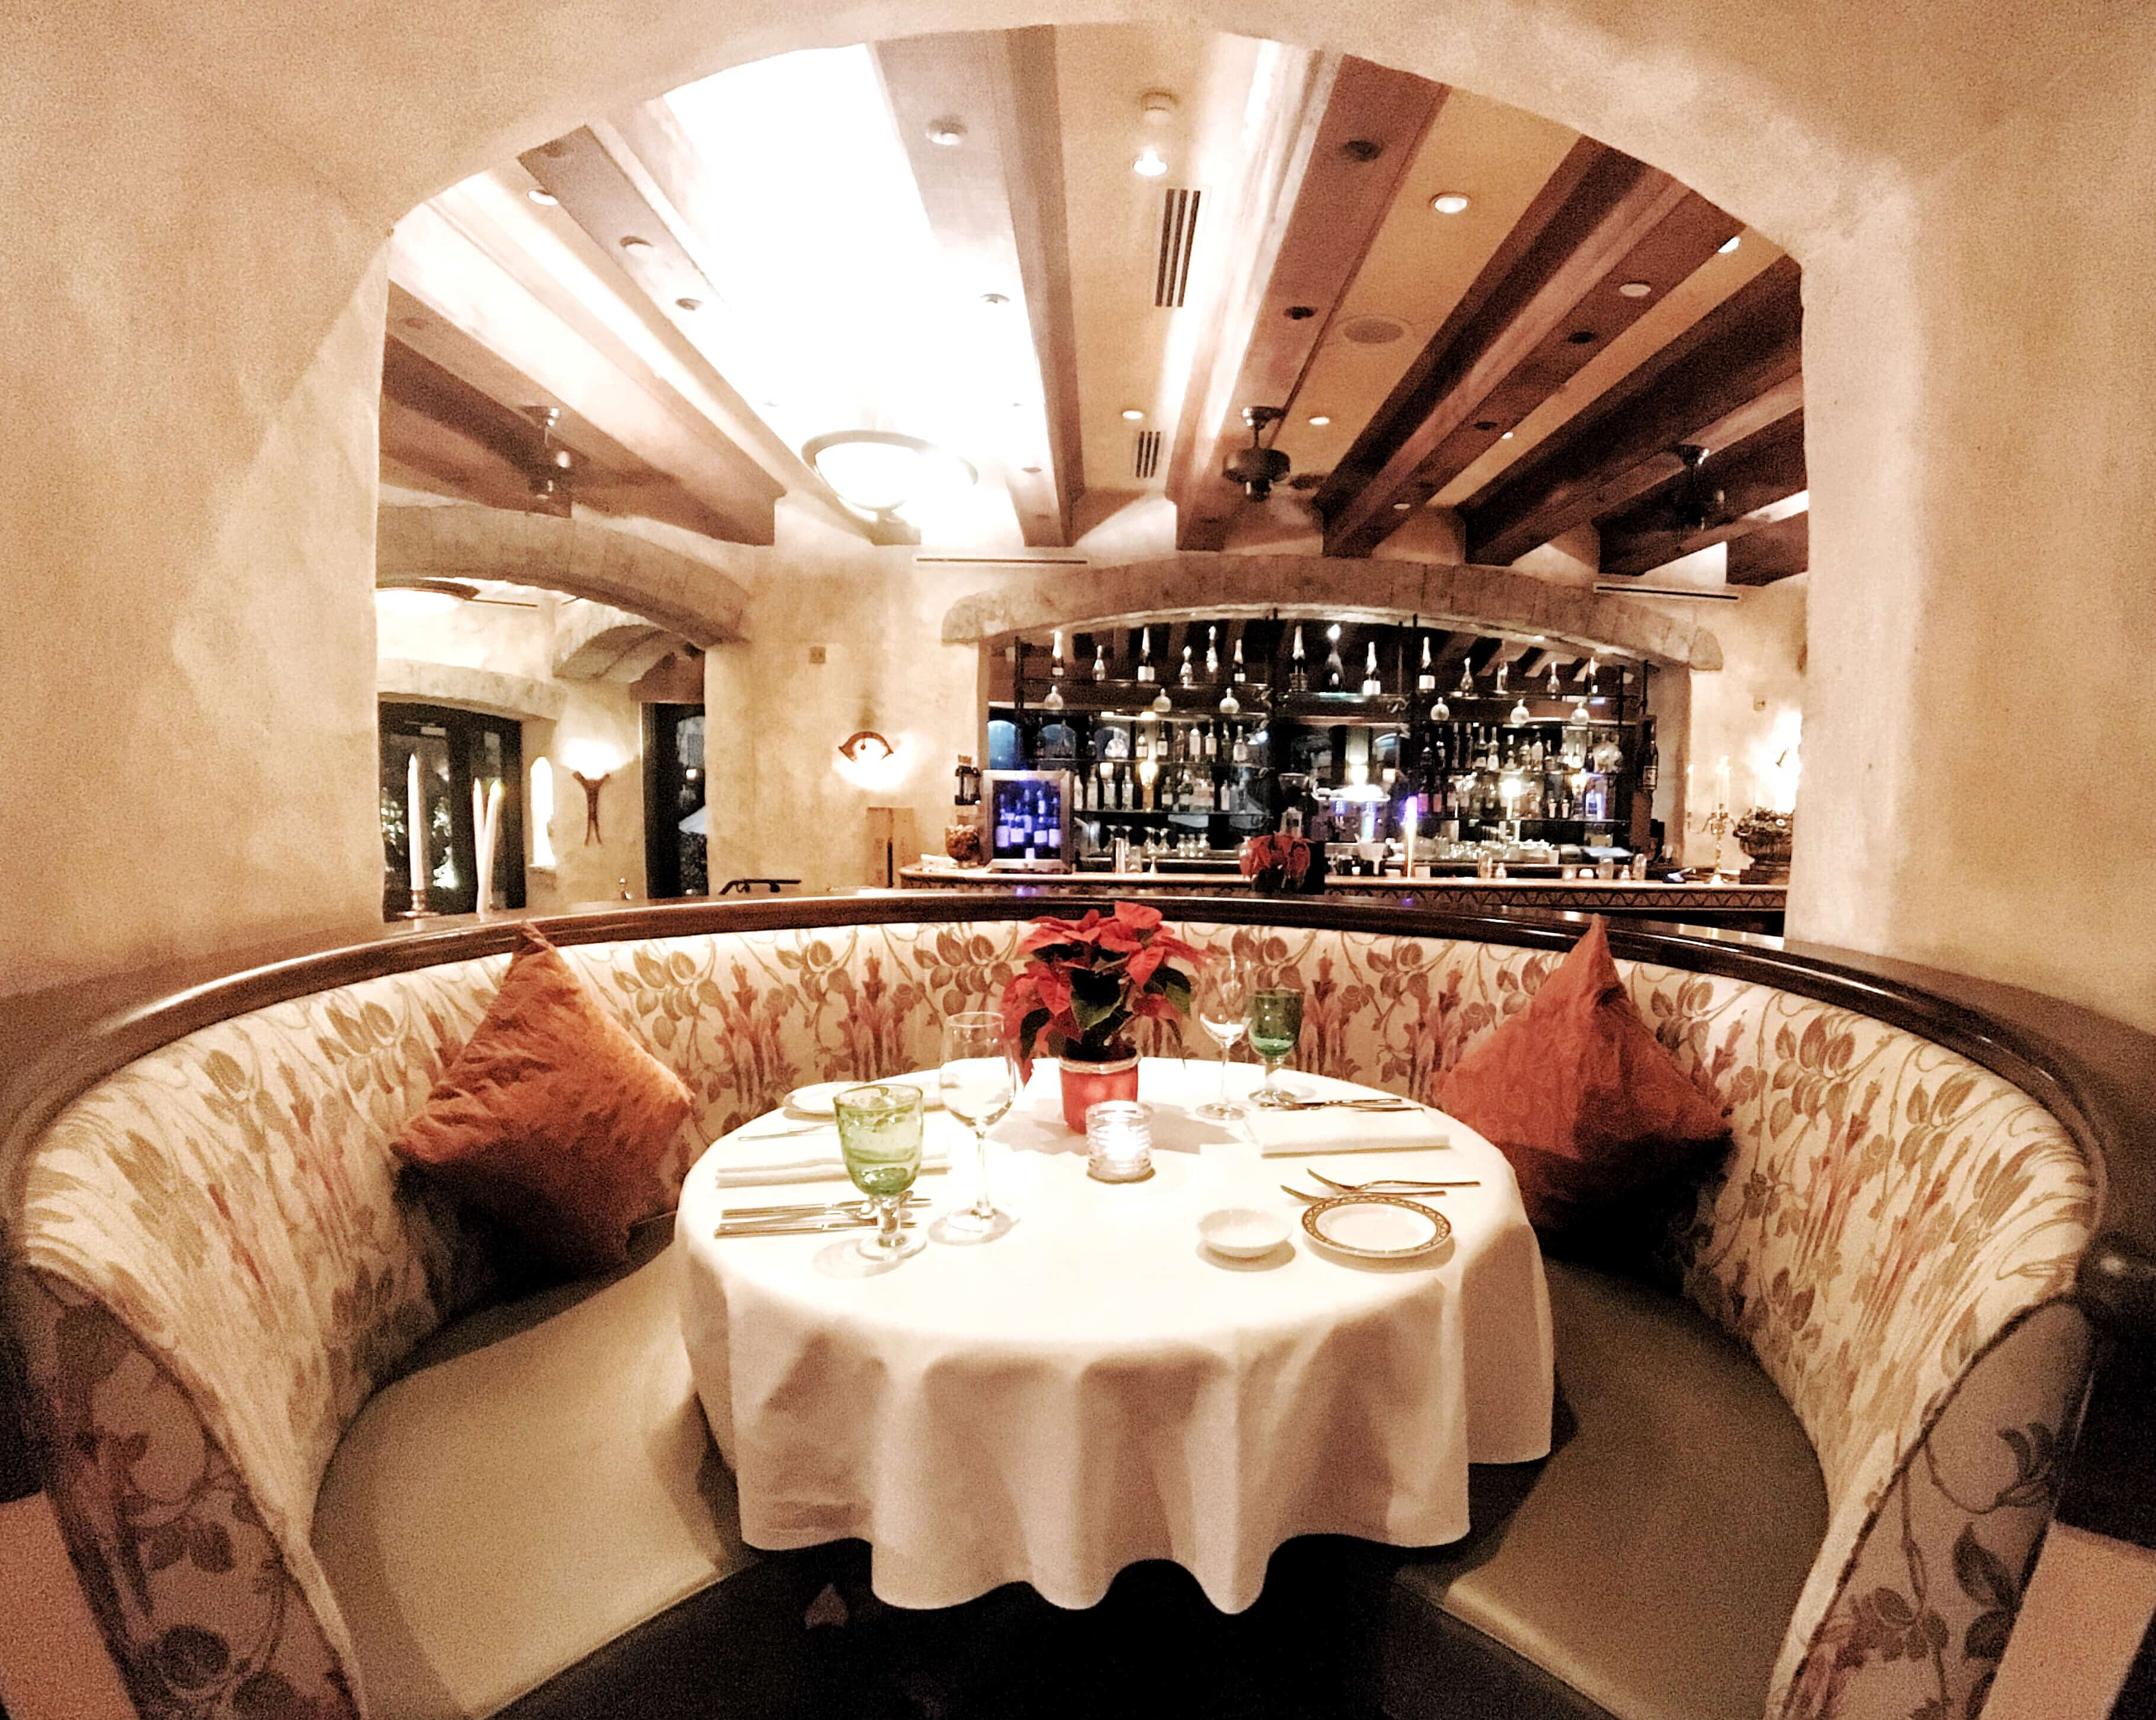 Villa Danieli Restaurant a highlight in our Kuala Lumpur experience